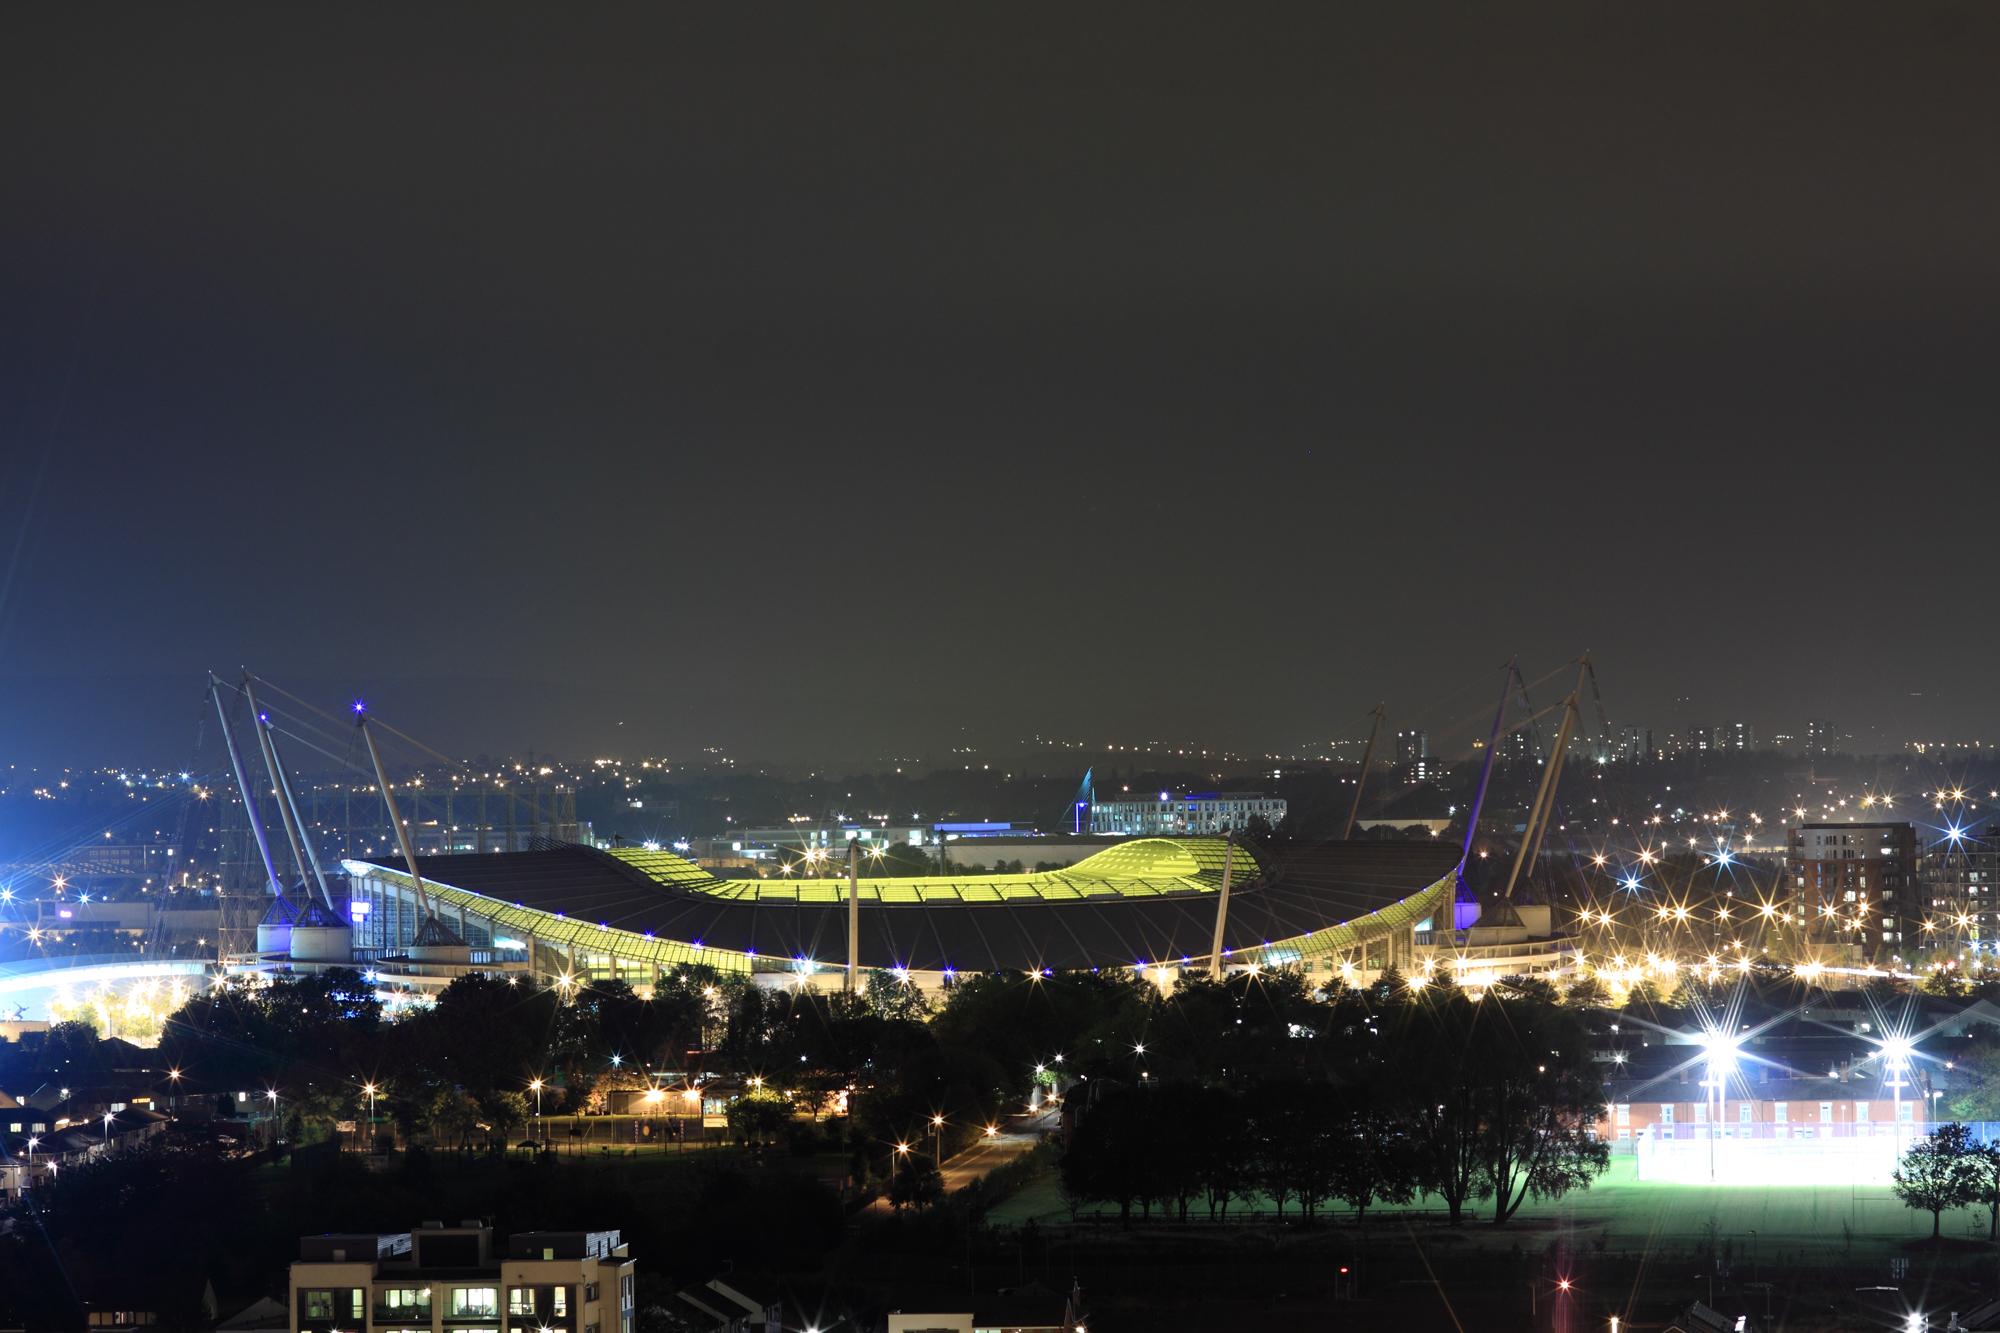 File:Etihad Stadium At Night, October 2011.jpg